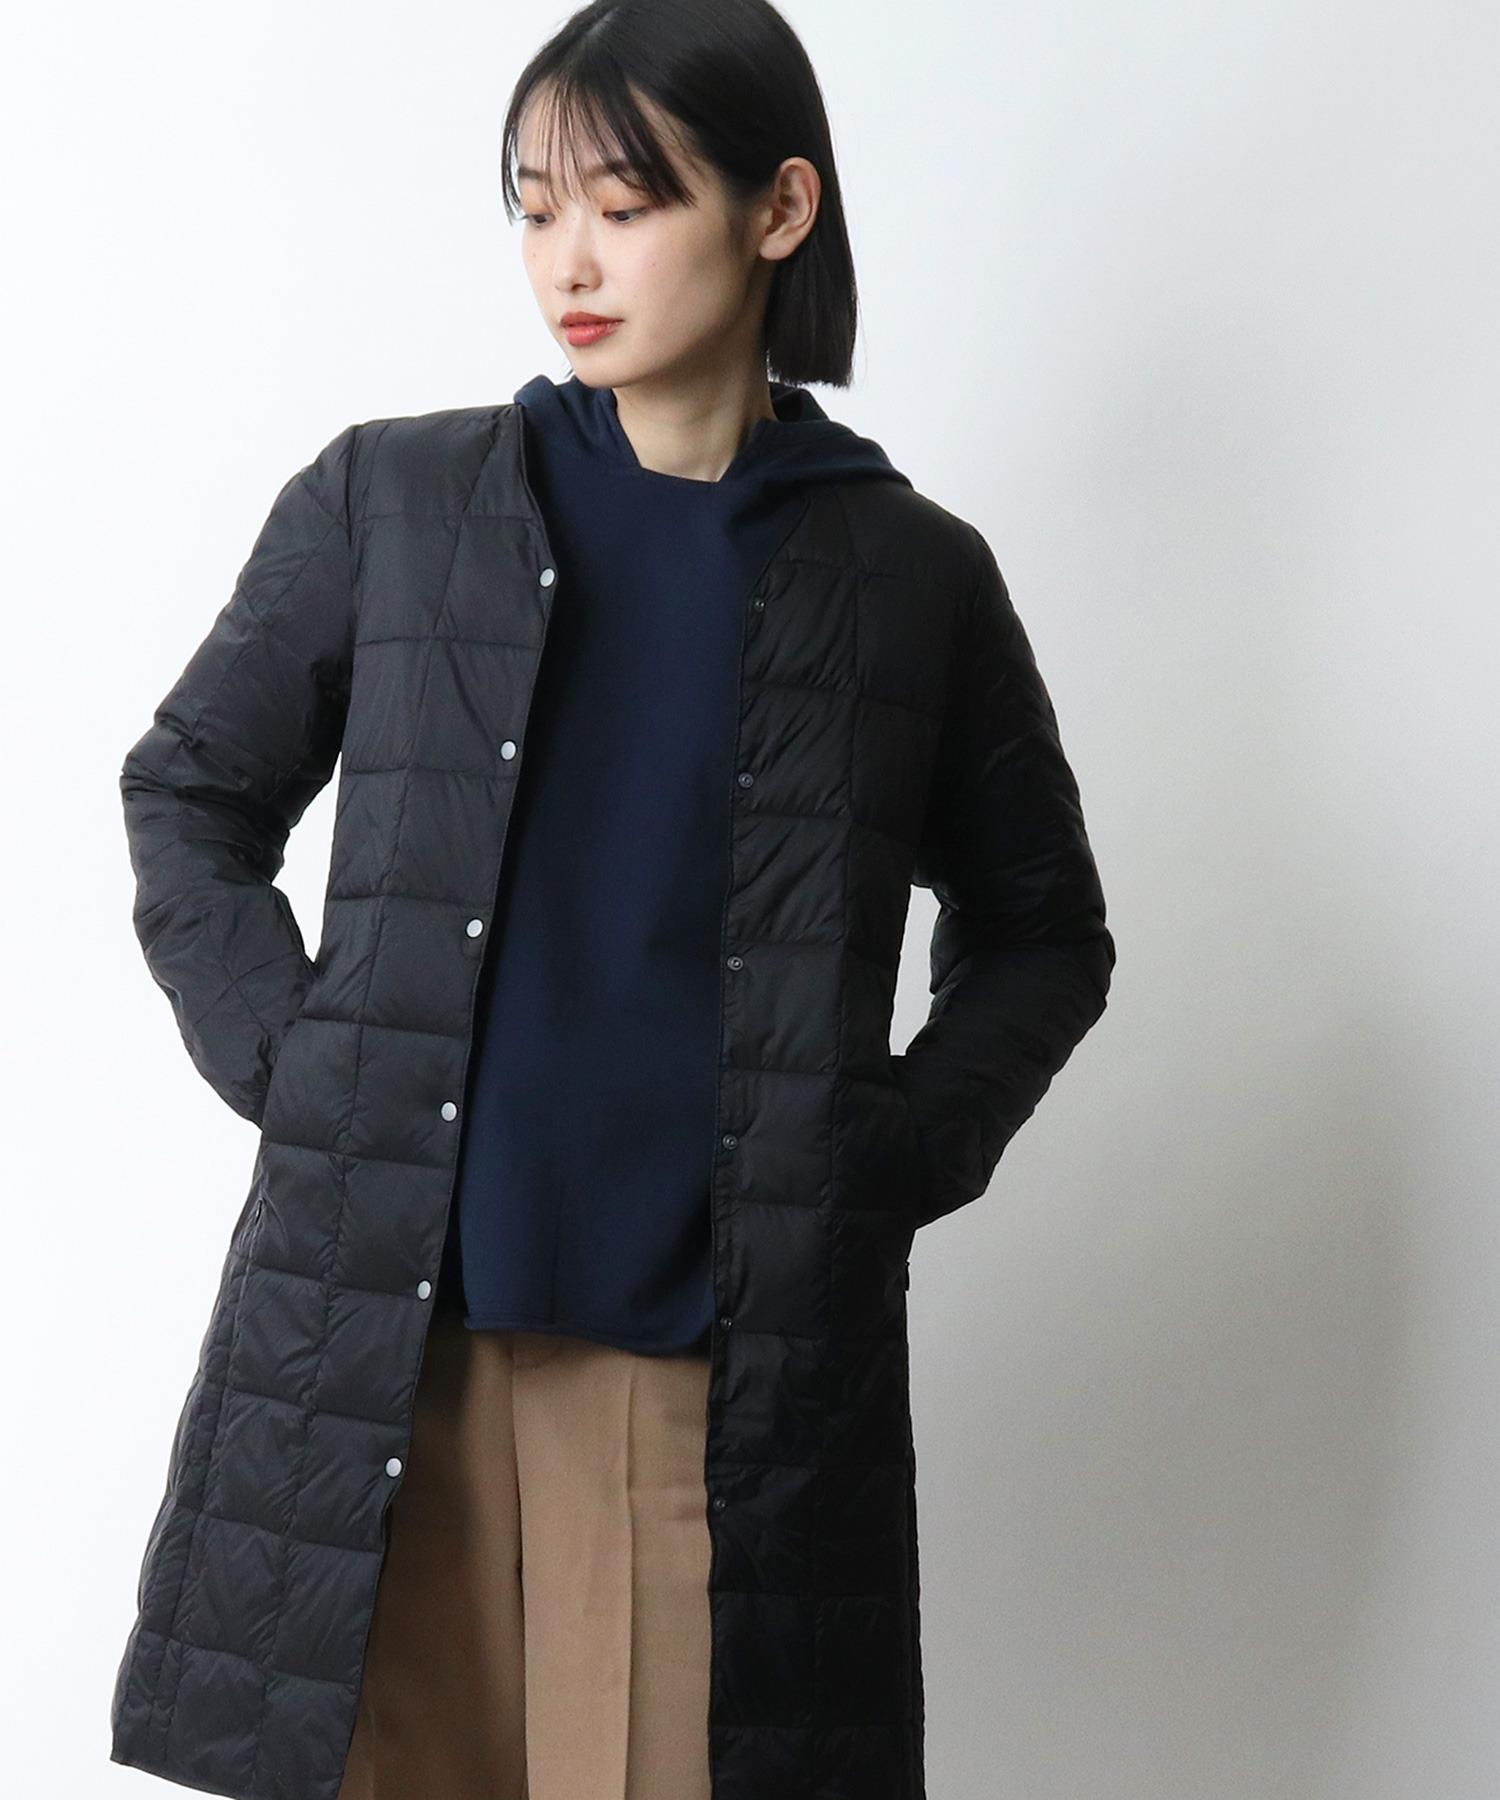 【 TAION / タイオン 】Vネックロングダウンジャケット TAION-W101-LONG‥